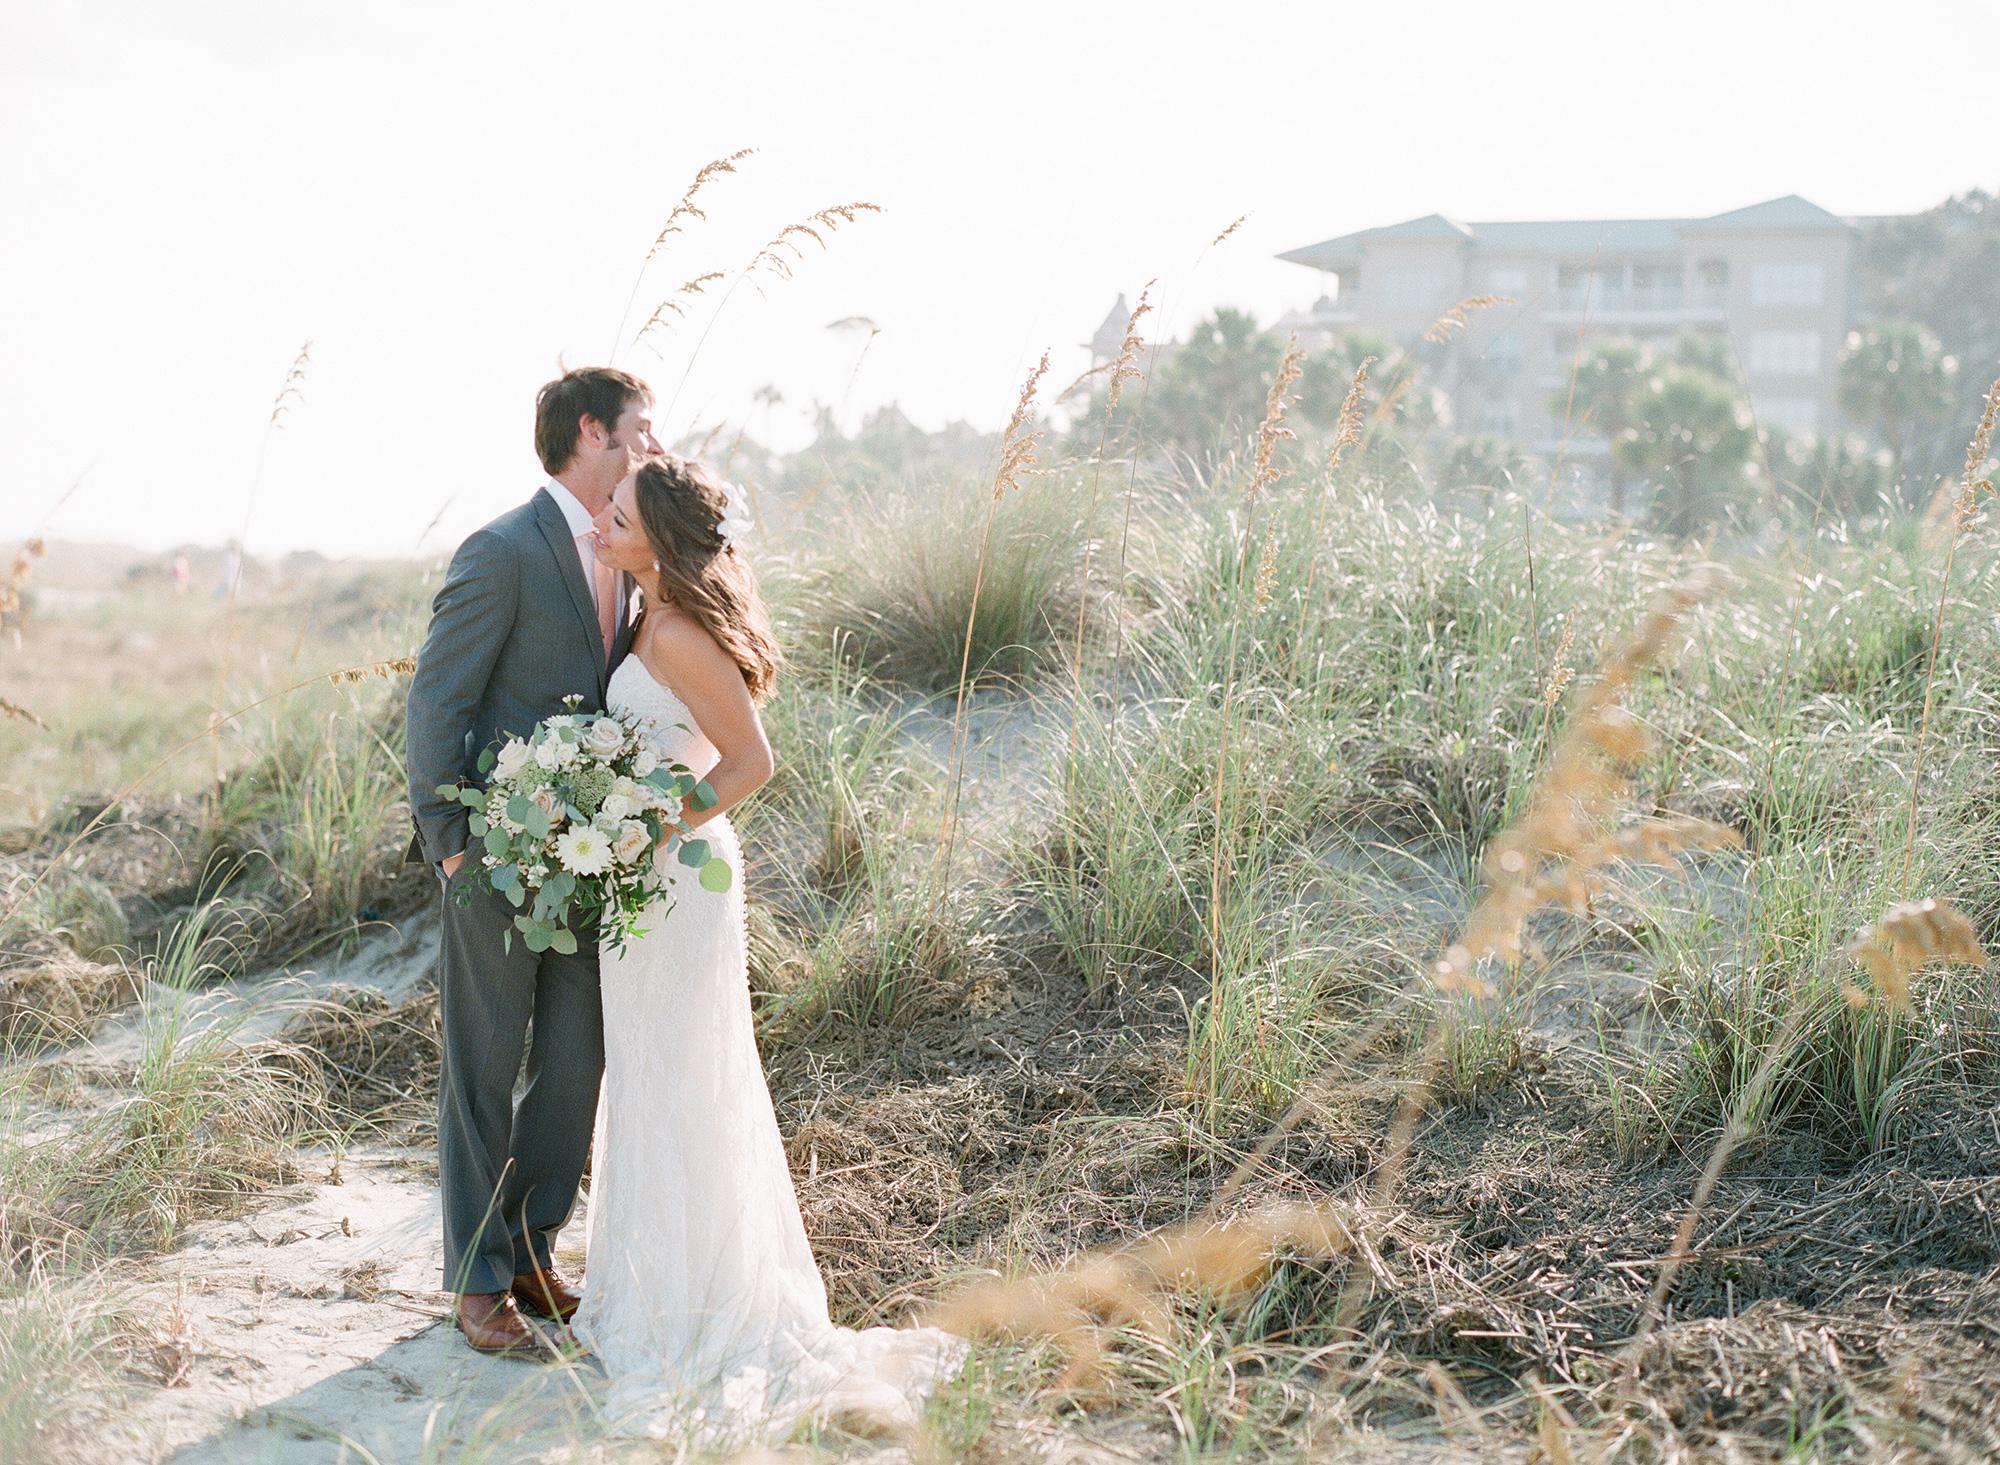 EverElla_Wedding_Beach_1.jpg